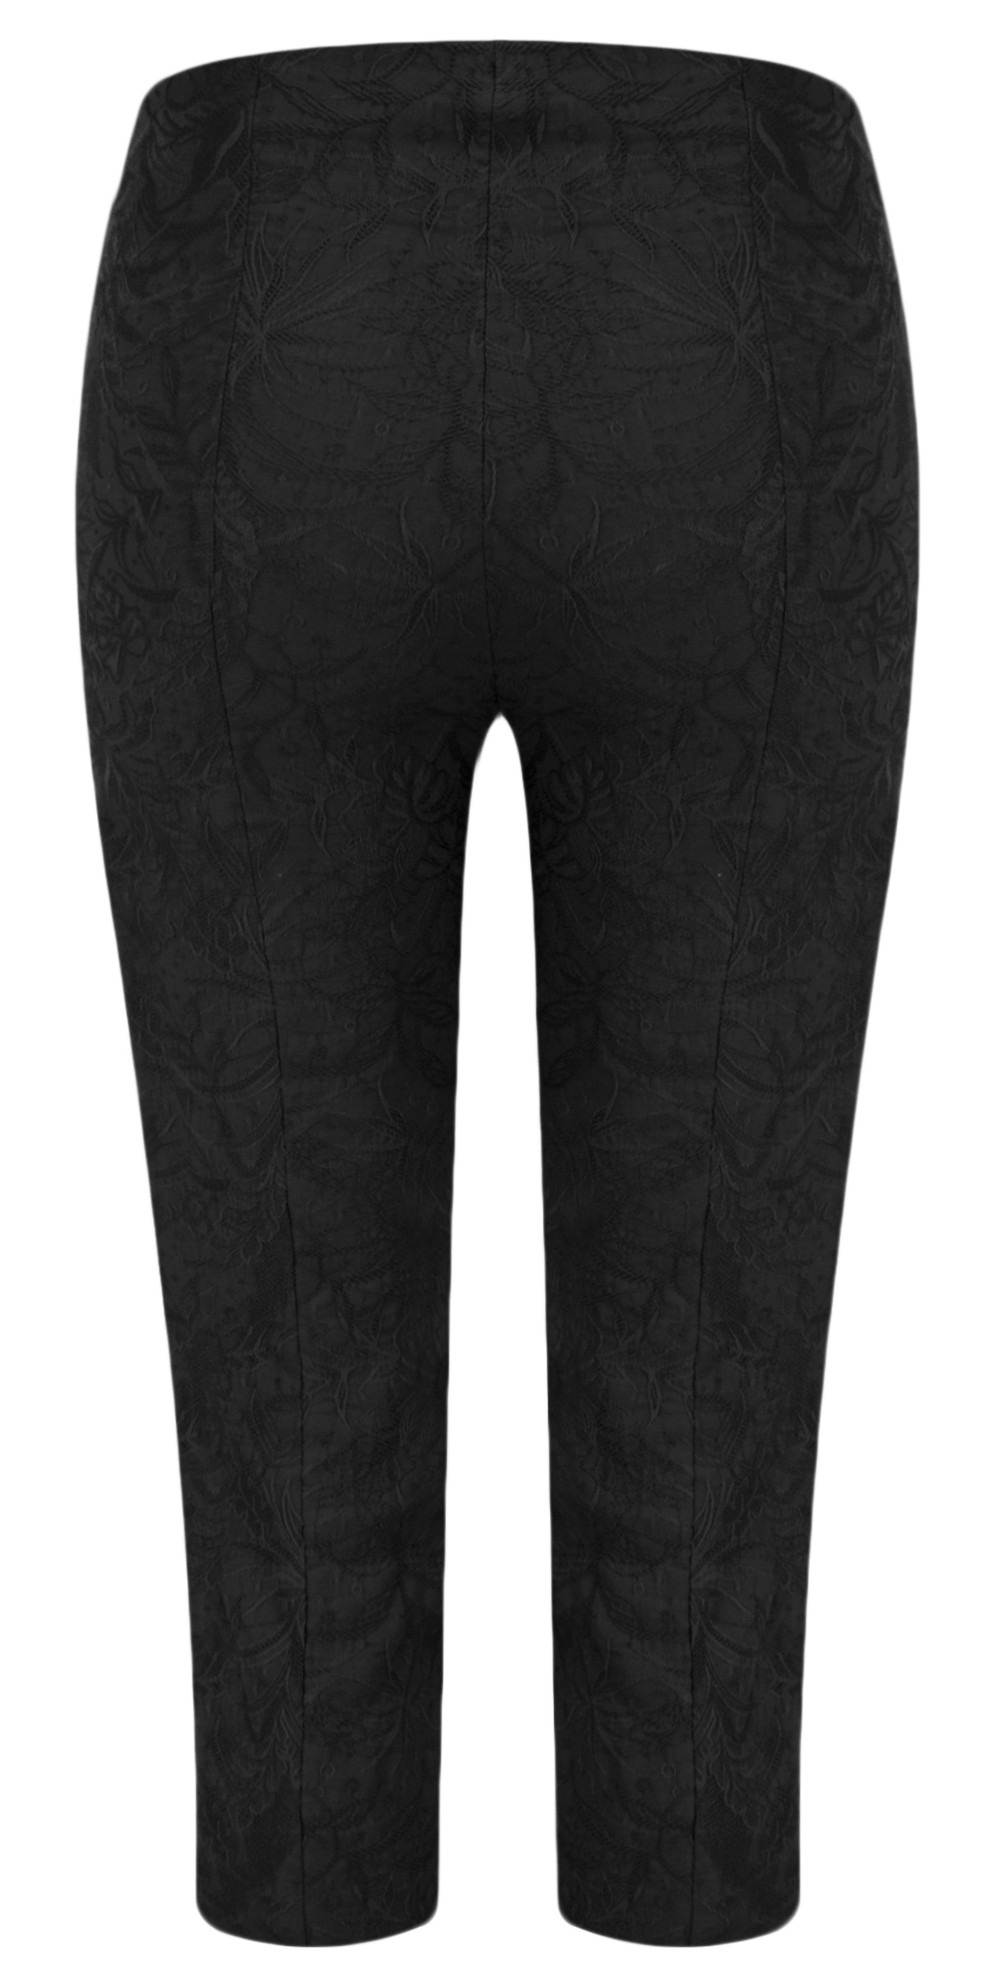 Marie 07 Black Jacquard Crop Trouser main image